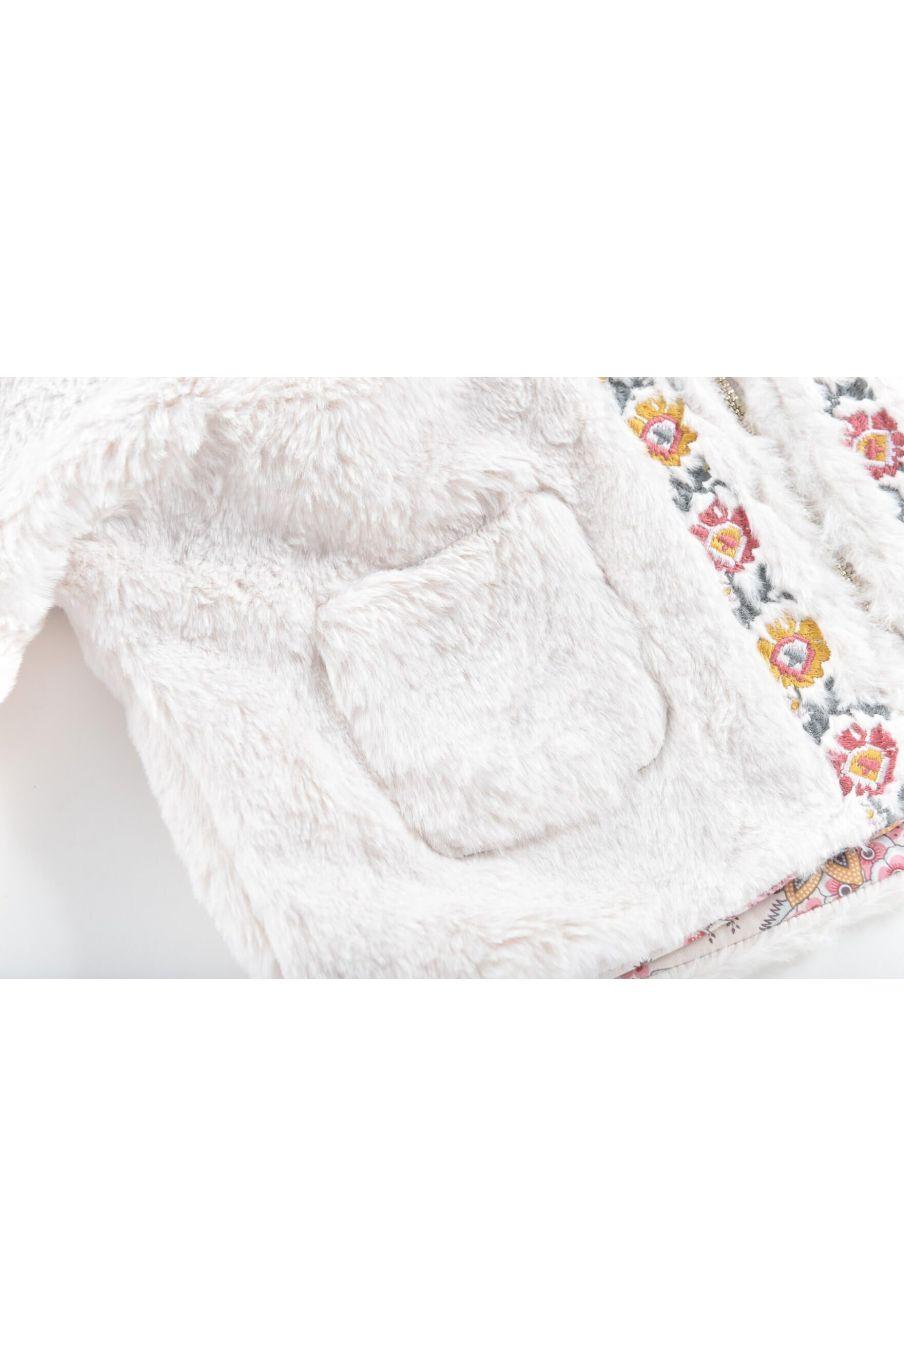 veste réversible fille felvet cream french flowers & fake fur - louise misha